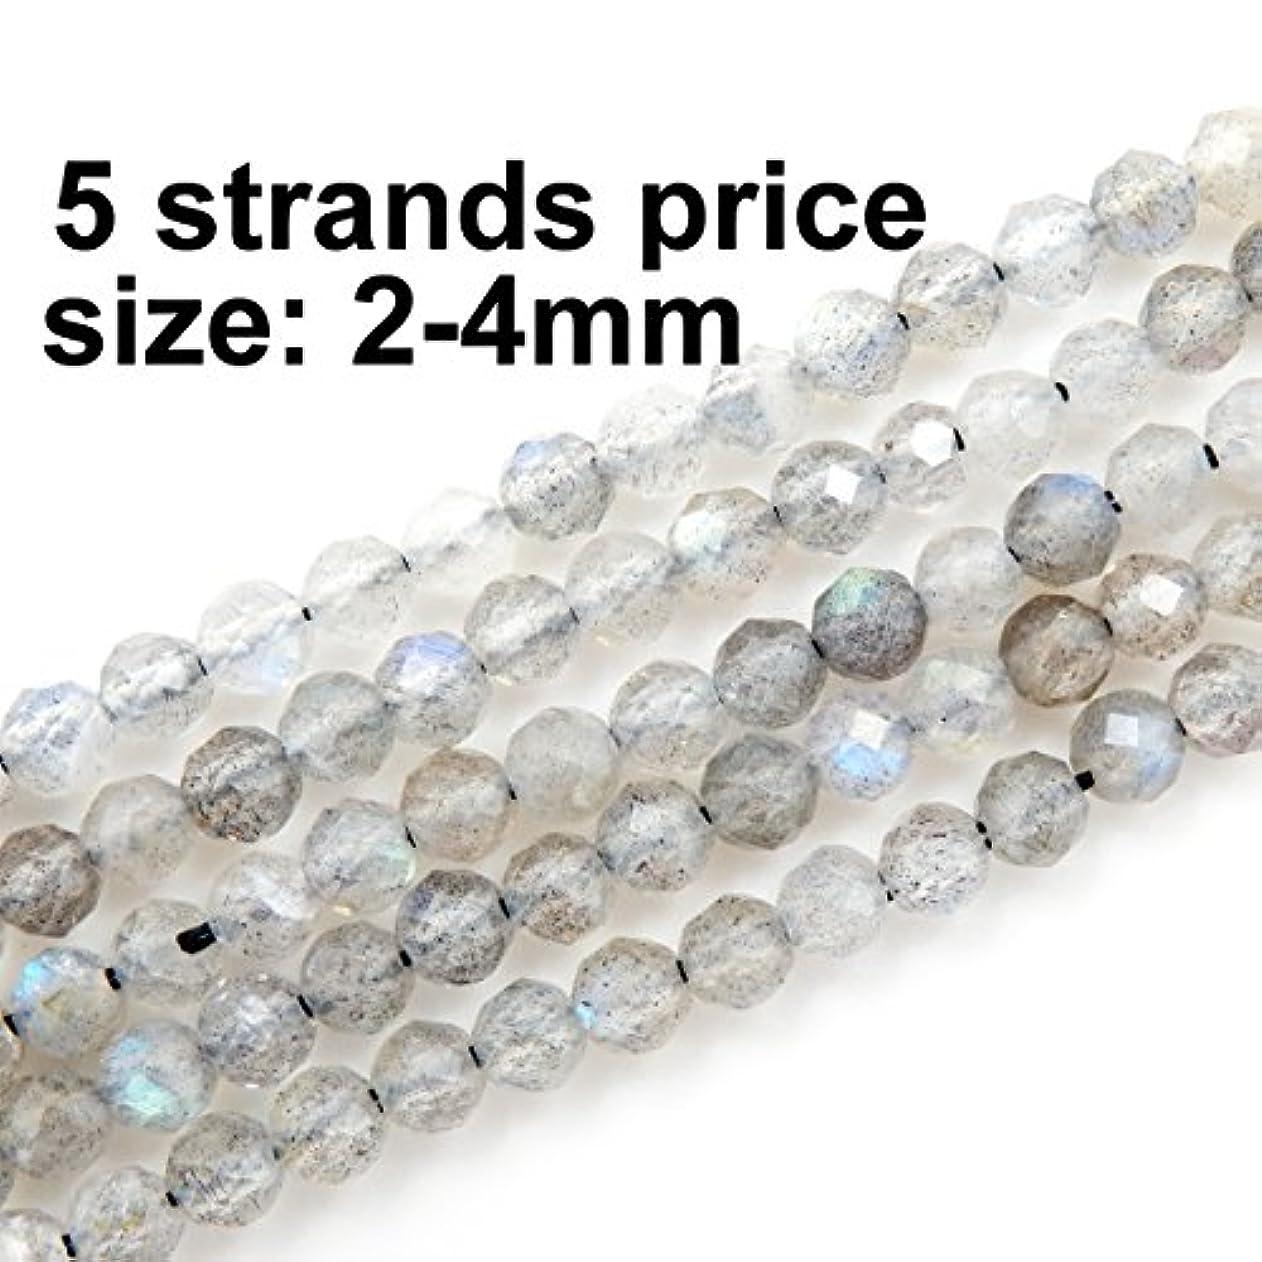 2-4mm Faceted Gemstone Beads for Jewelry Making, Sold per Bag 5 Strands Inside (Labradorite, 2mm) avtfpfpggwd32446